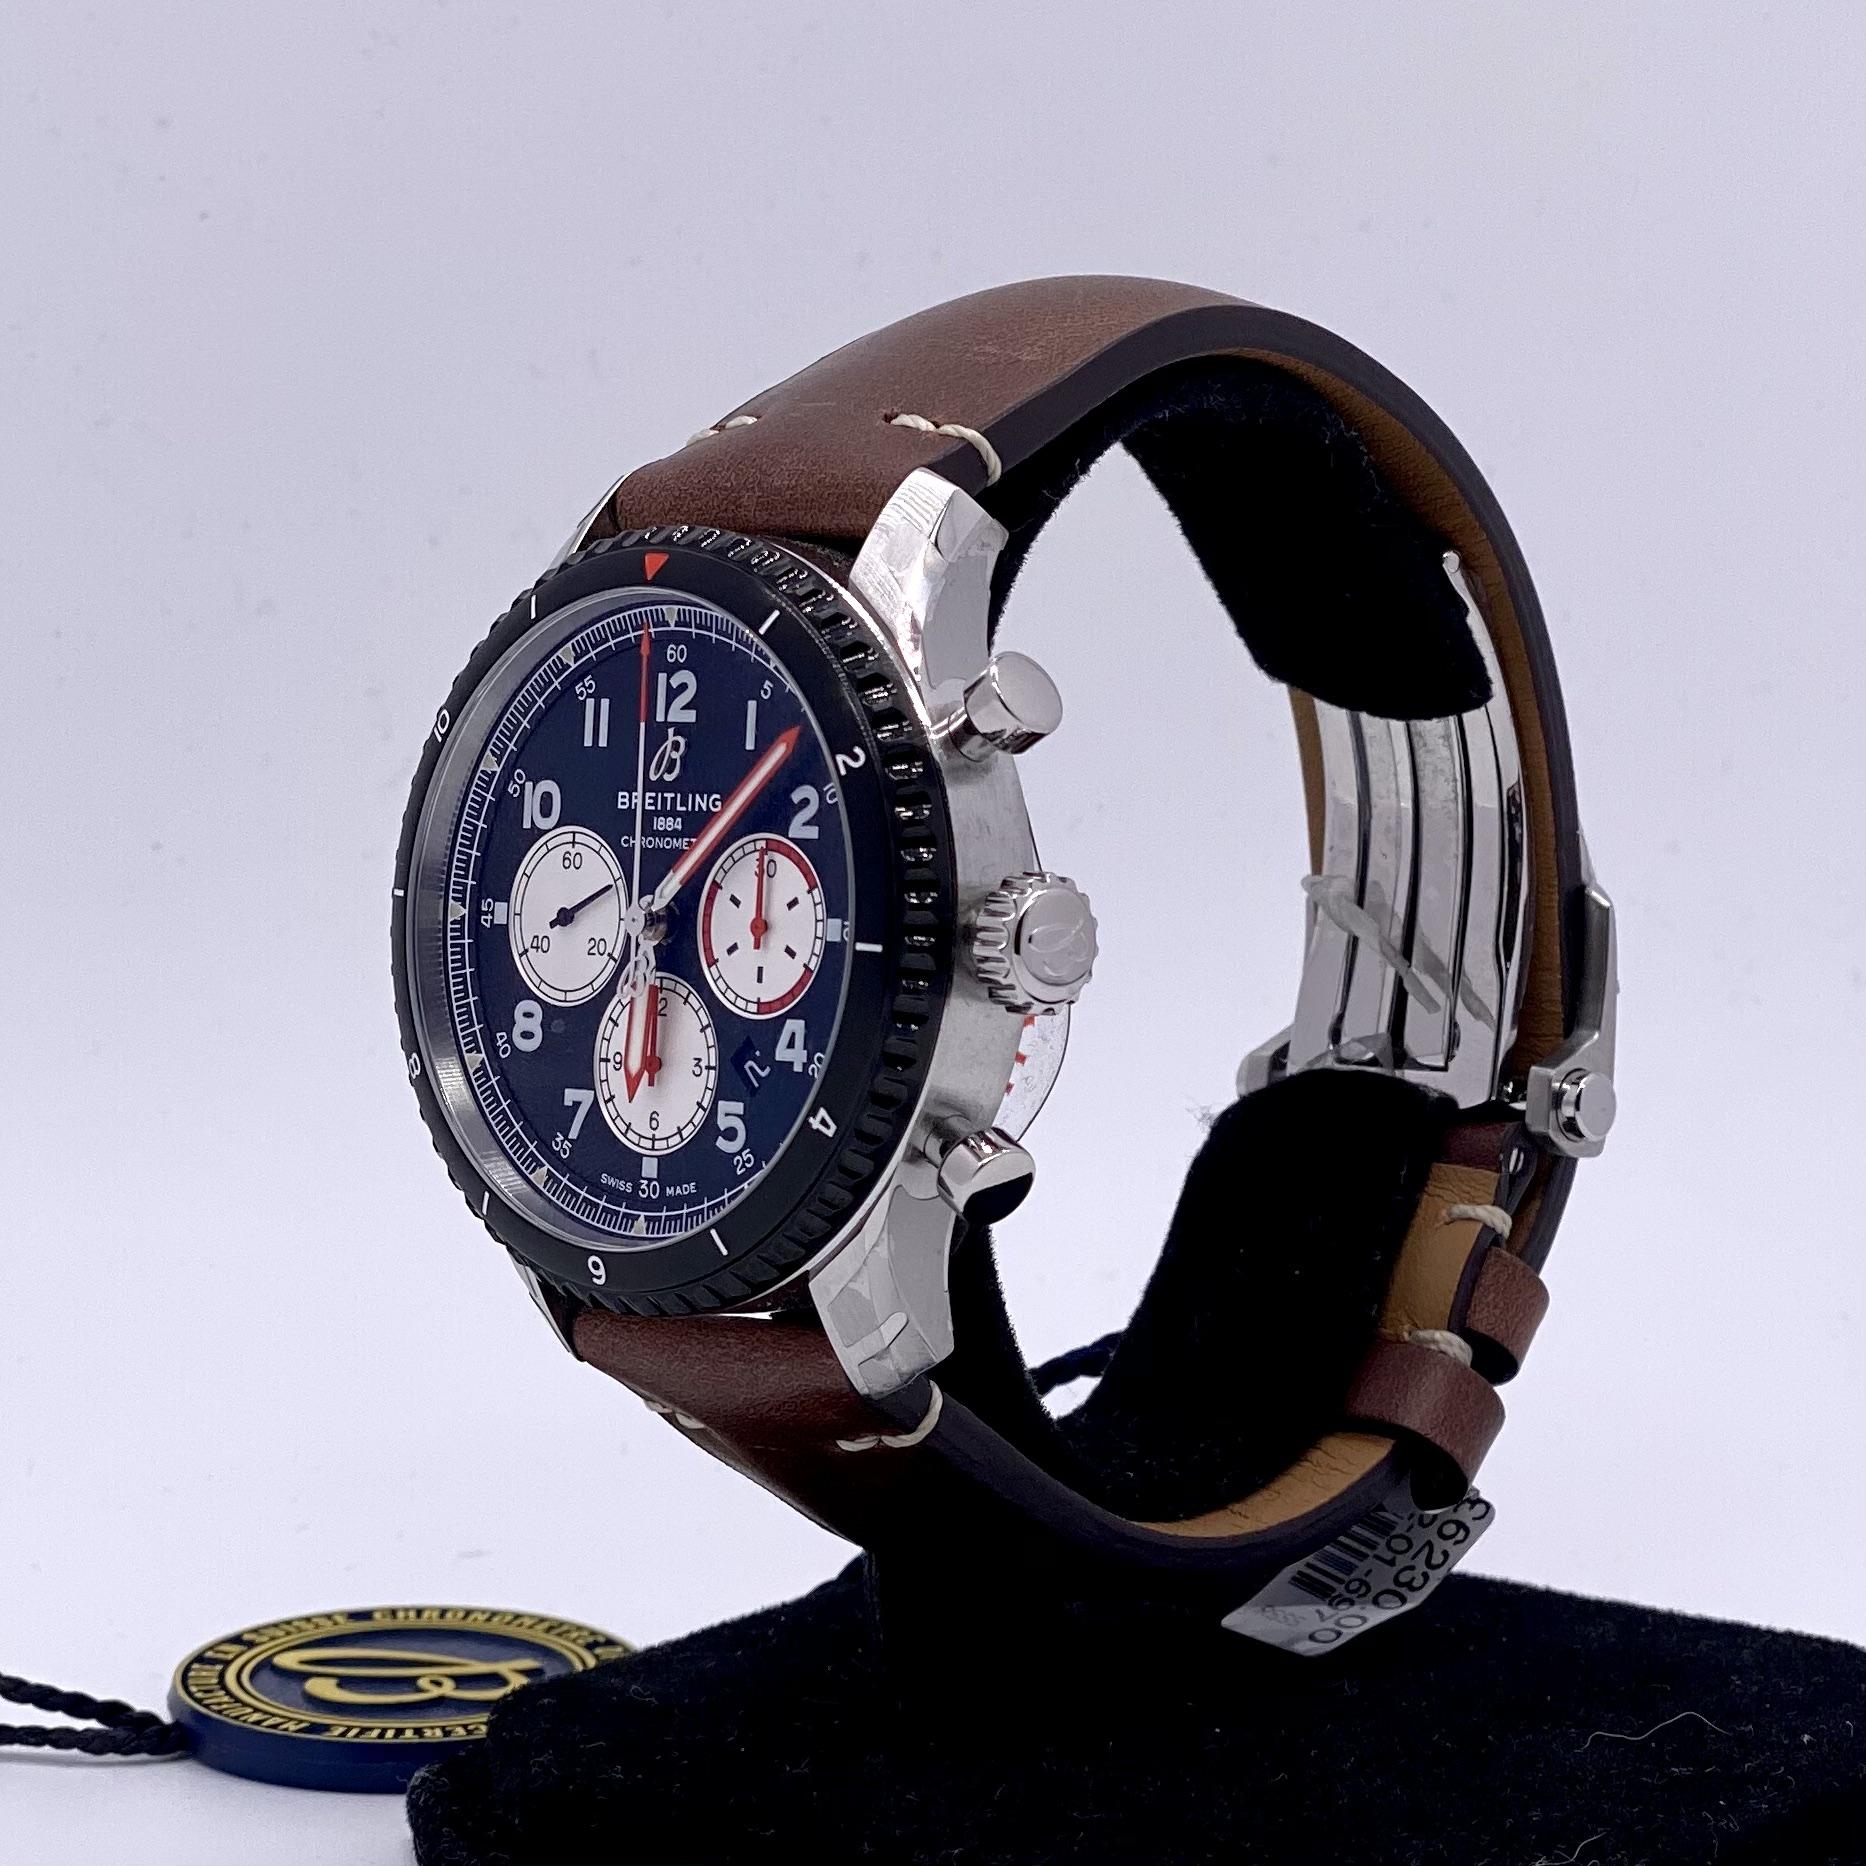 Breitling Chronometer AB0119 - Image 2 of 3